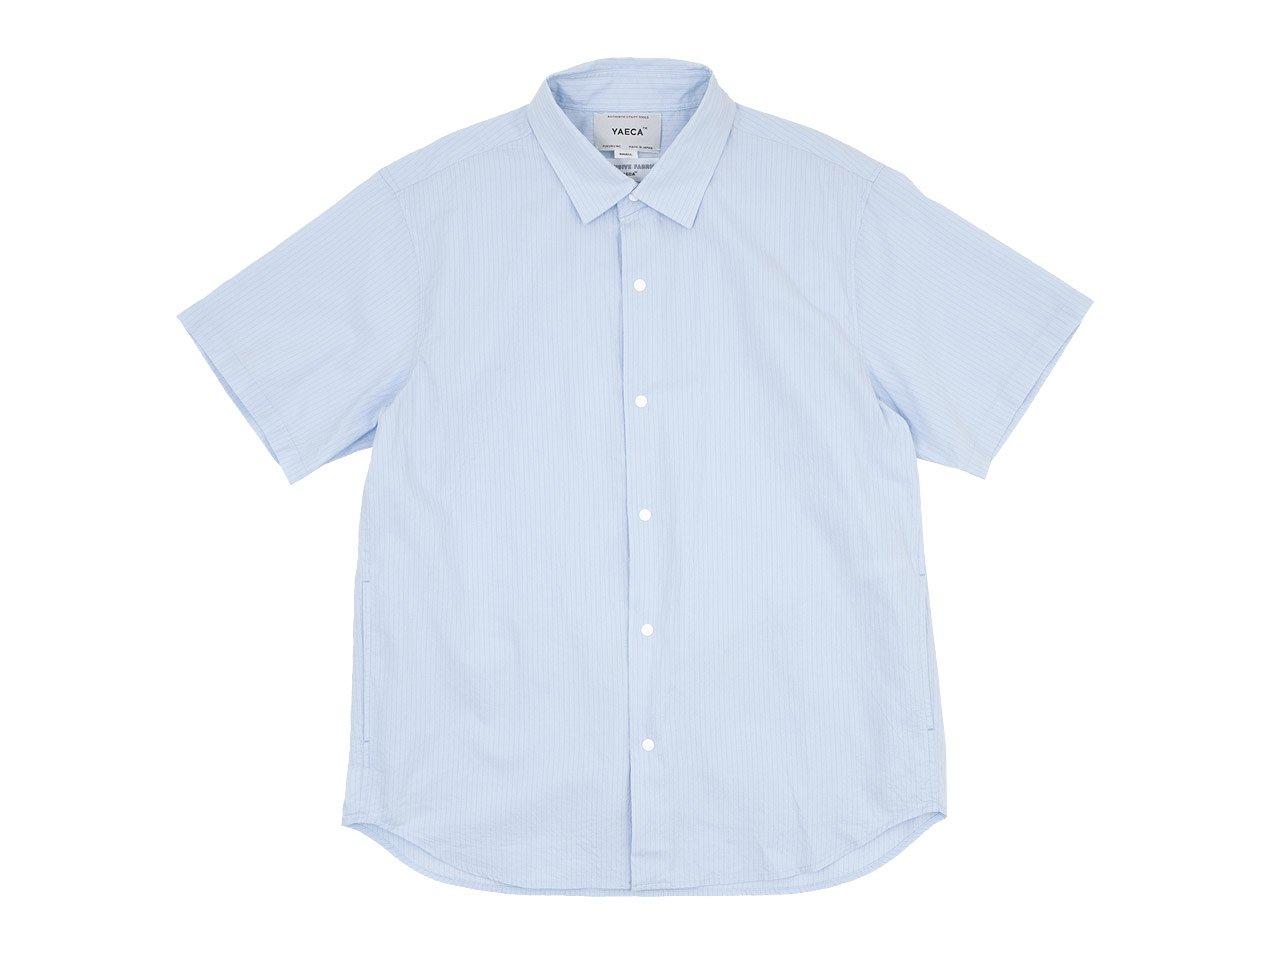 YAECA コンフォートシャツ リラックス ロング 半袖 SAX STRIPE 〔メンズ〕